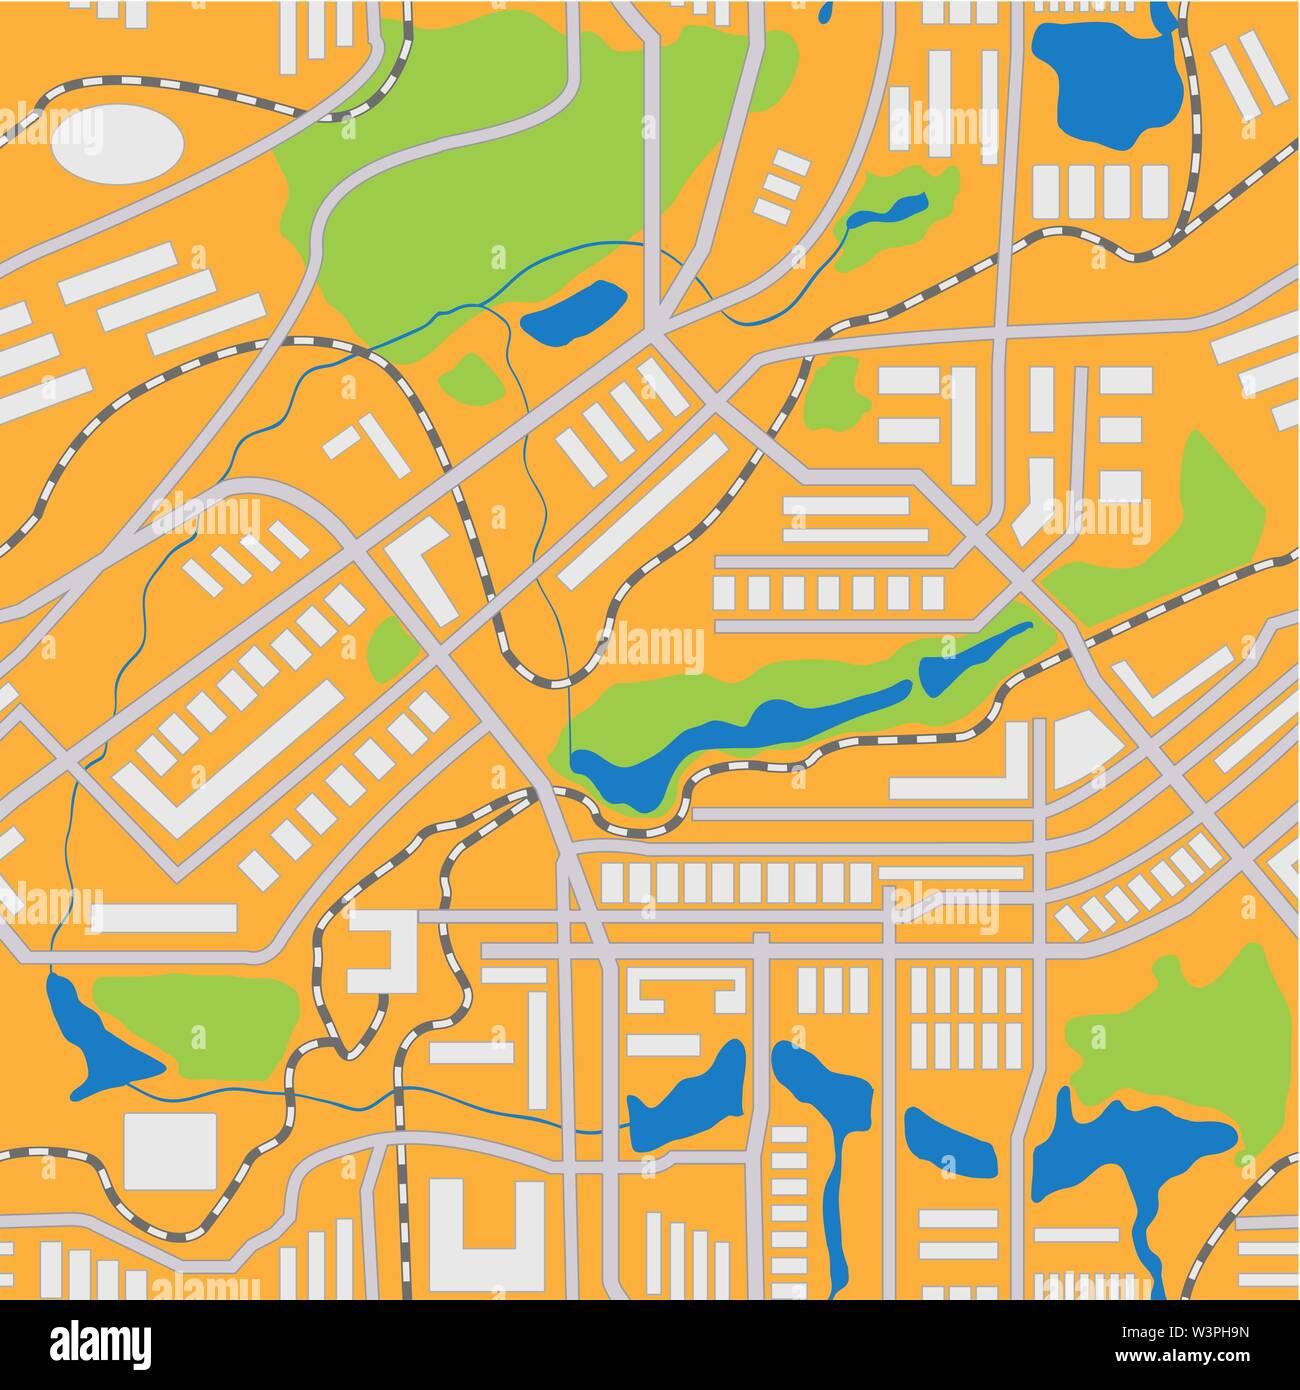 City map seamless pattern. Vector illustration - Stock Vector